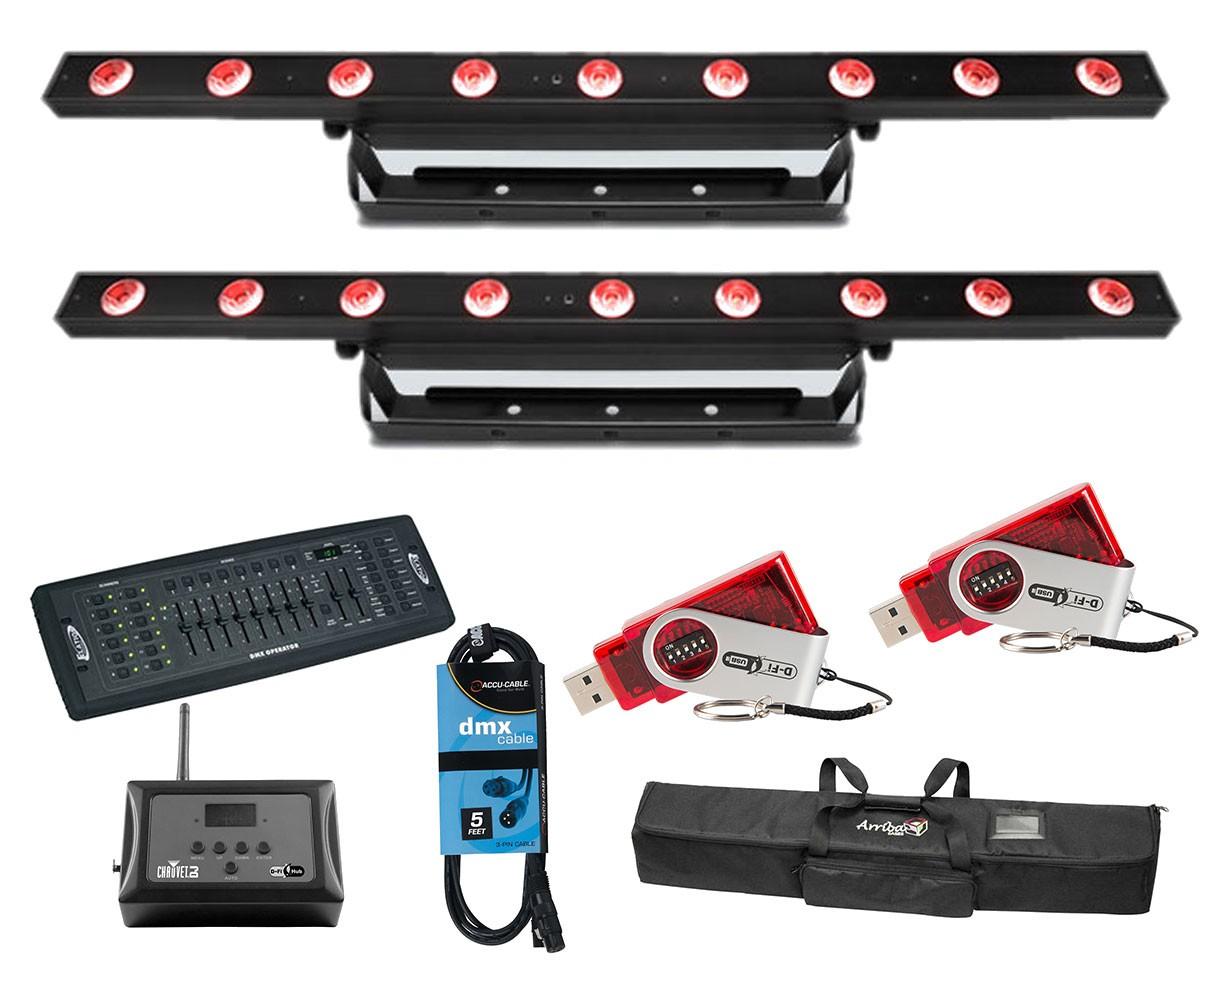 2x CHAUVET DJ COLORband H9 USB + Controller + D-Fi Hub and USB + Bag + Cable